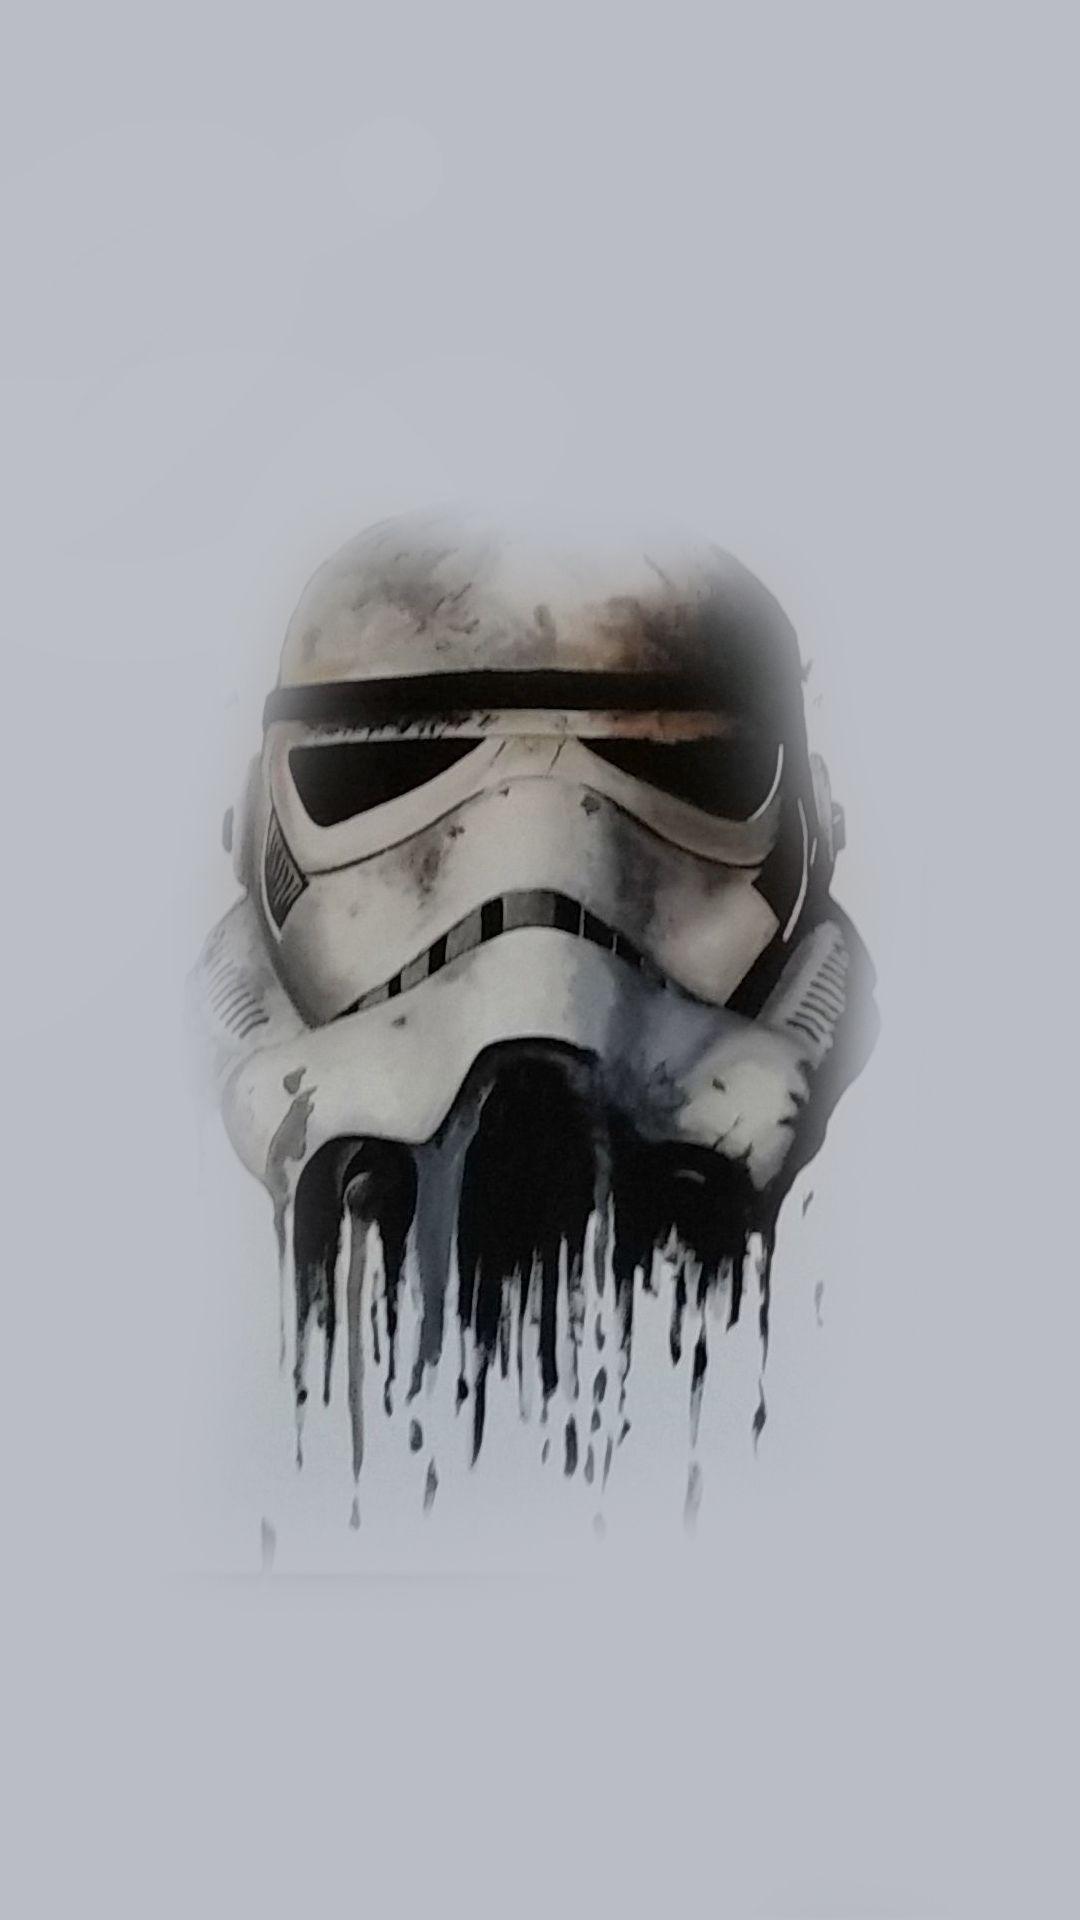 Stormtrooper Helmet Star Wars Pinterest Helmets